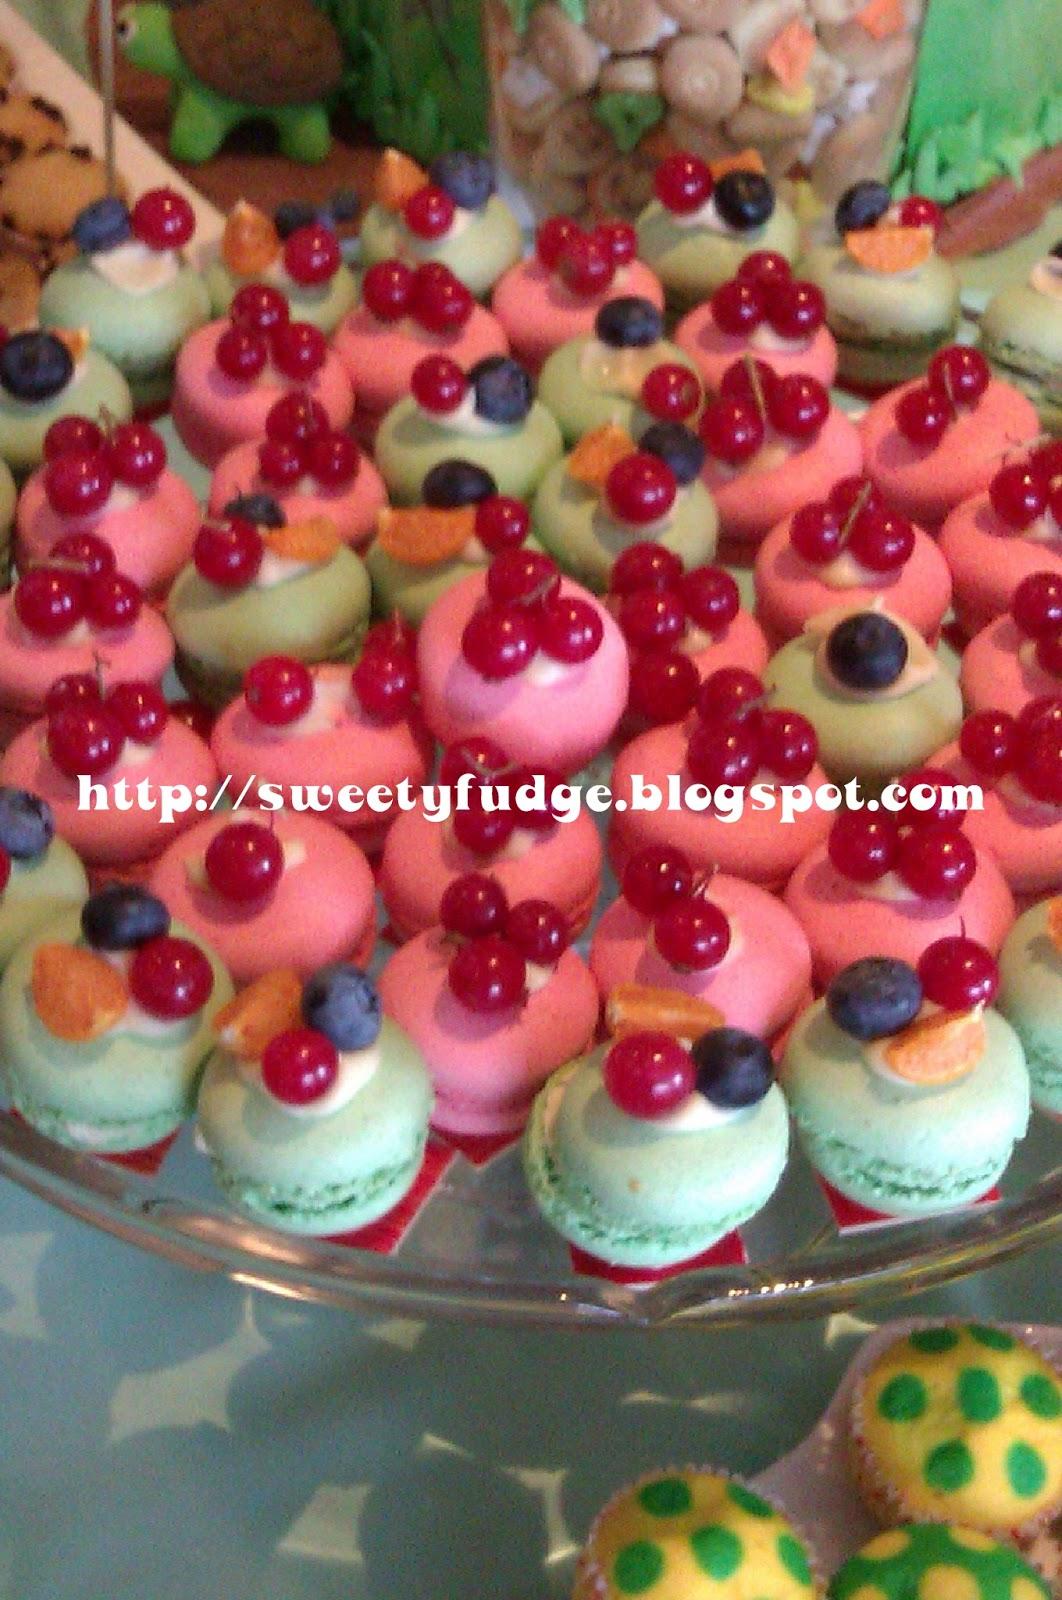 Sweetyfudge Bakery (001925672-X): Red Velvet Cupcake: Puan